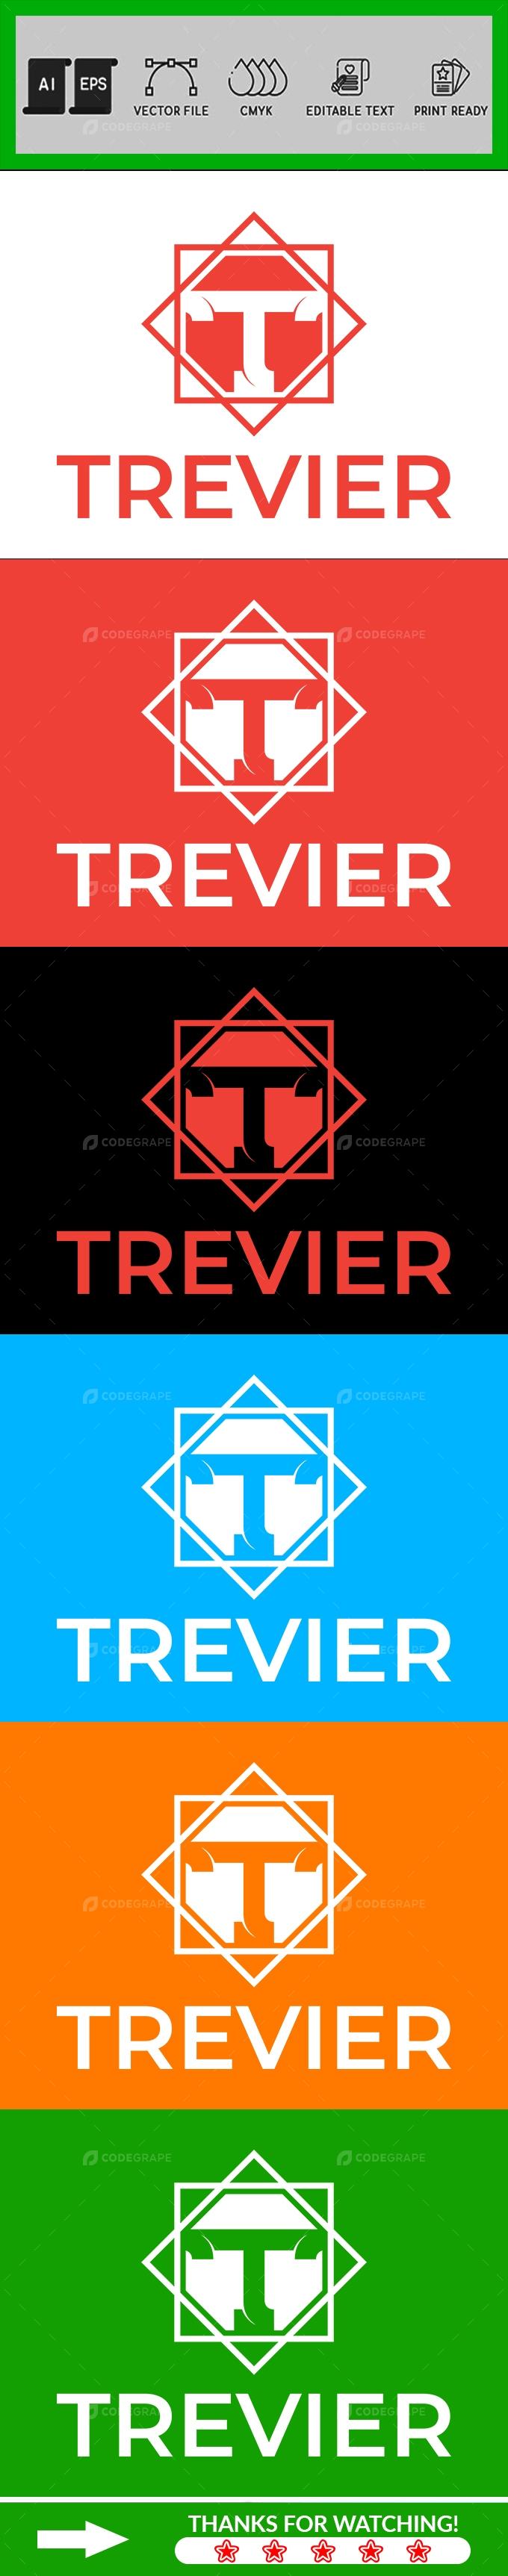 Minimalist Travel Logo Design Template